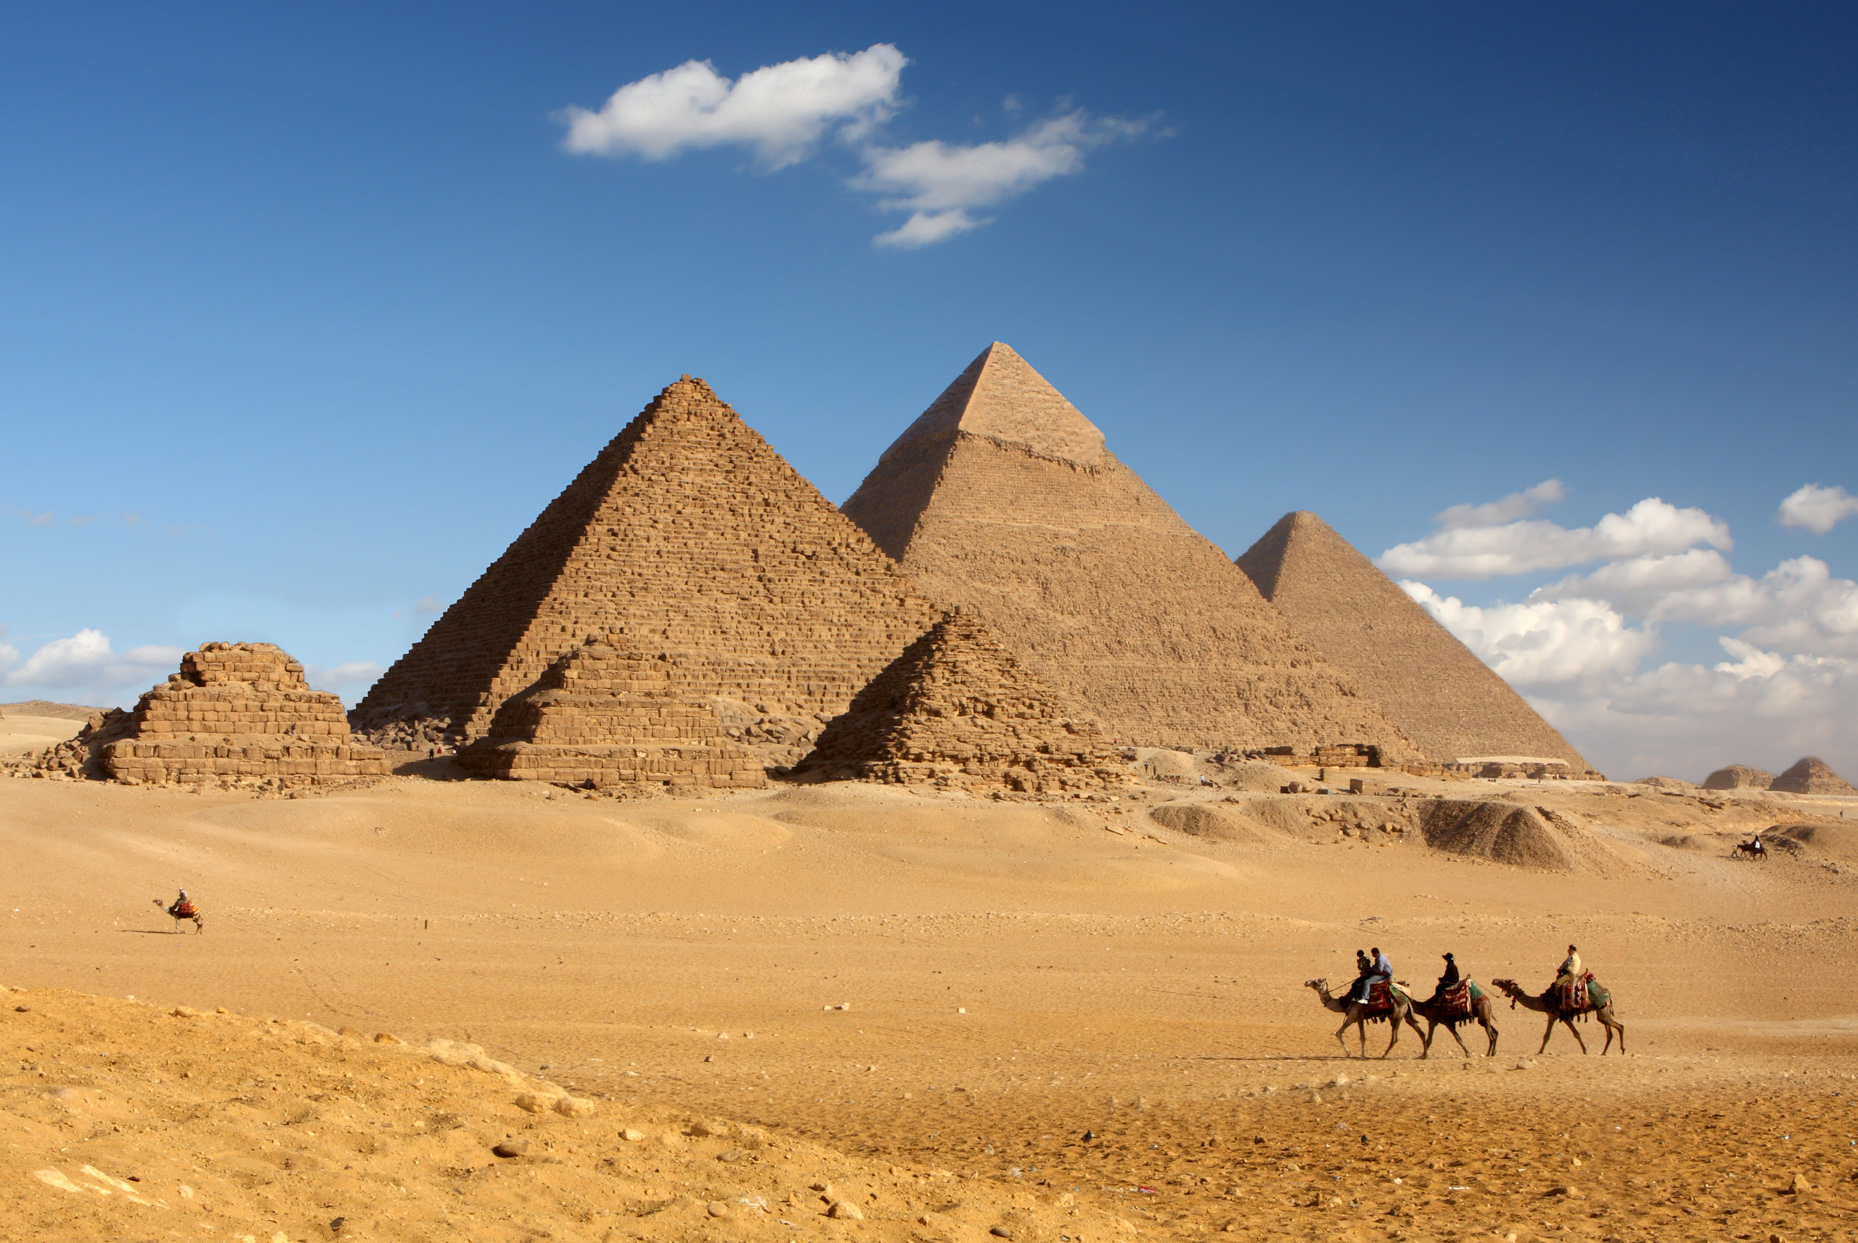 اهرام مصر The Pyramids at Giza